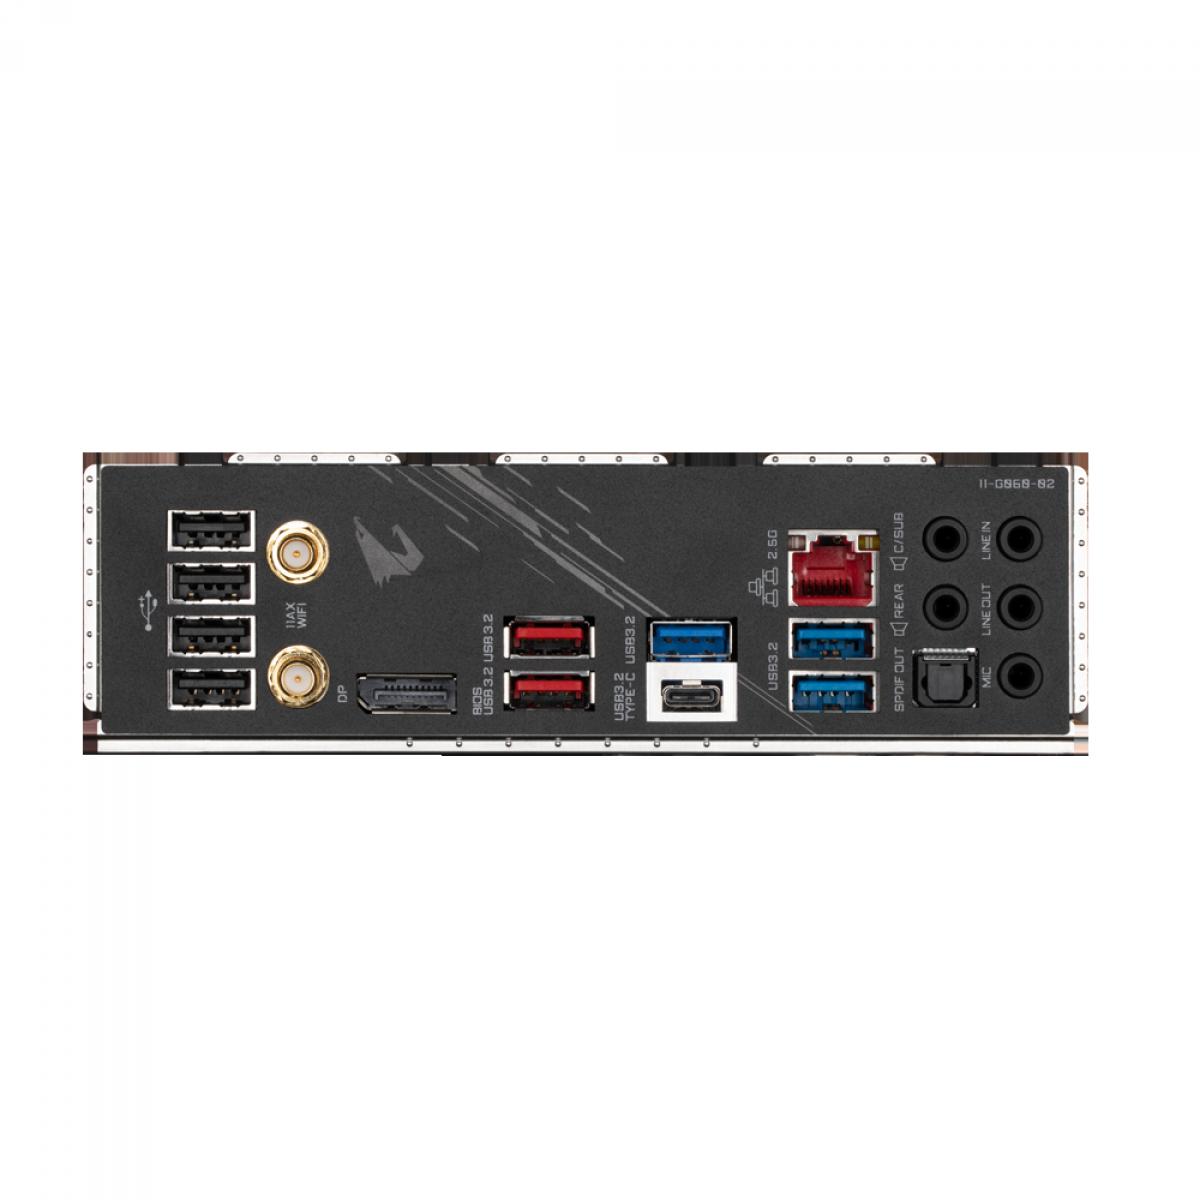 : Placa Mãe GIGABYTE Z590 AORUS ELITE AX (rev.1.0), Intel Z590 Express Chipset, Socket 1200, ATX, DDR4